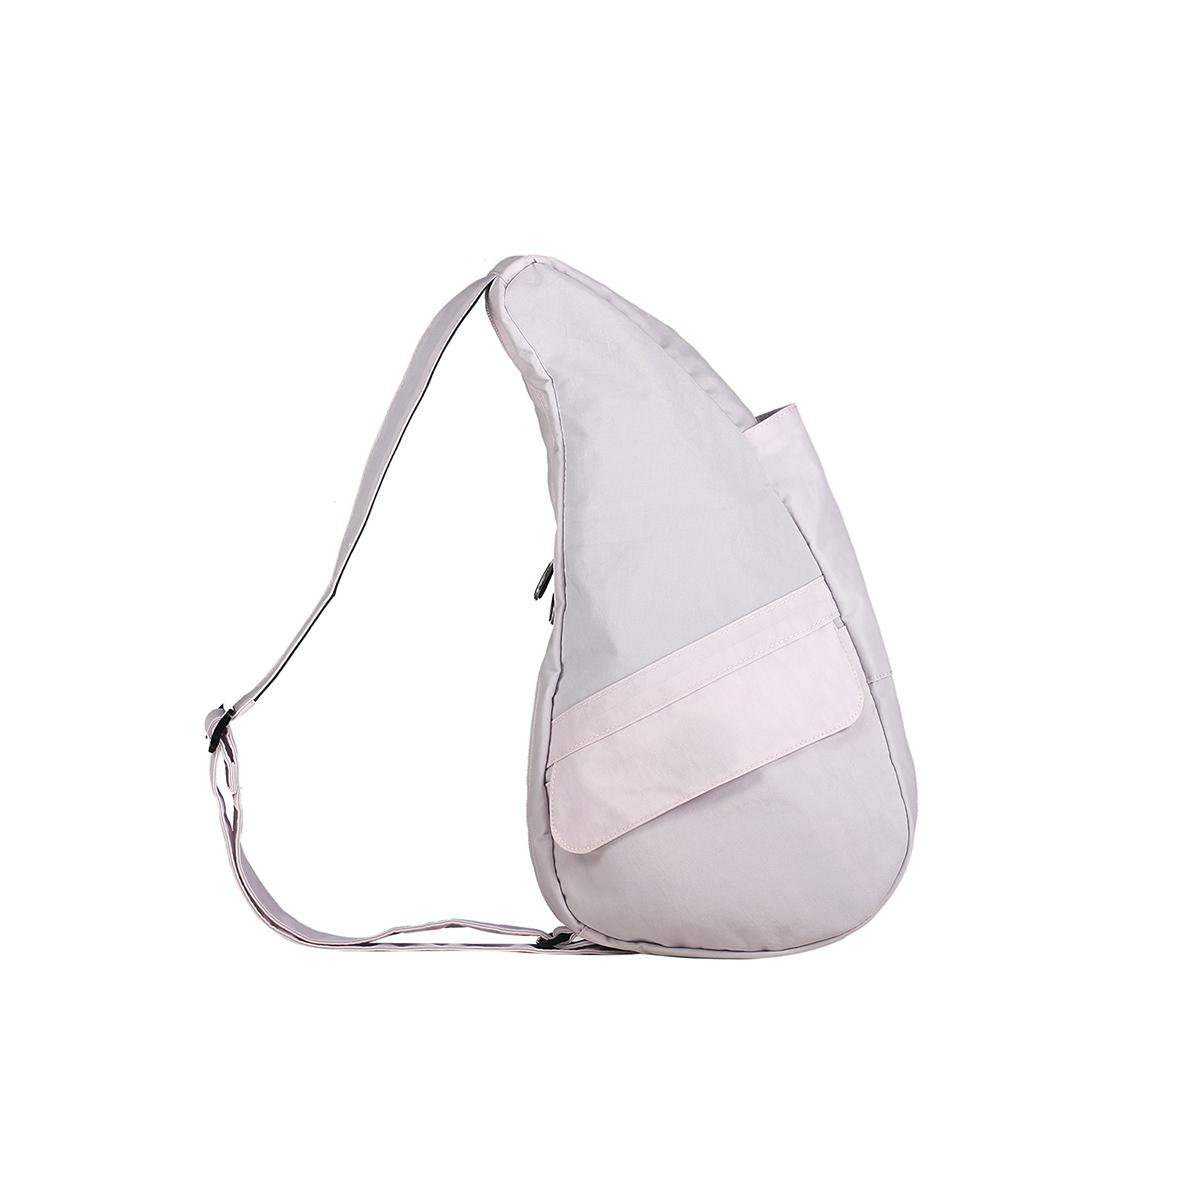 Healthy Back Bag/ヘルシーバックバッグ/ショルダーバッグ/ボディバッグ/旅行バッグ/軽量/レディース/メンズ 《限定ポーチ付》 公式ストア ヘルシーバックバッグ テクスチャードナイロン Sサイズ オパールホワイト